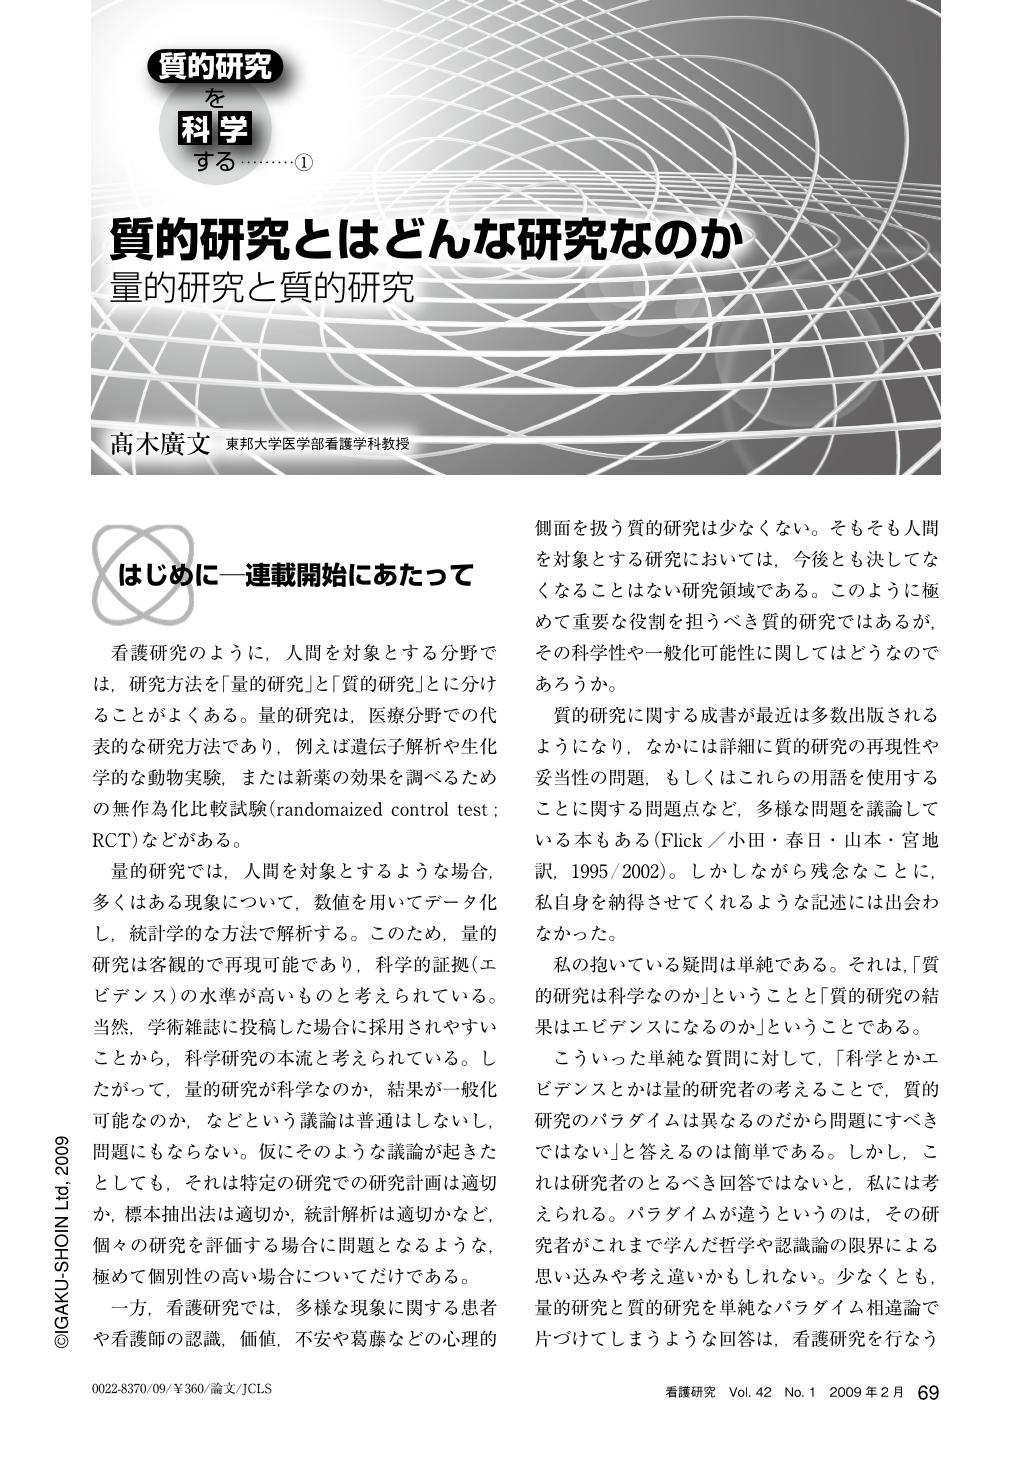 KANGO-KENKYU                                                                                                                              Volume 42, Issue 1                                                                                                                            (February 2009)                                                                                                                                                                                                    看護研究                                                                                                                            42巻1号                                                                                                                            (2009年2月)